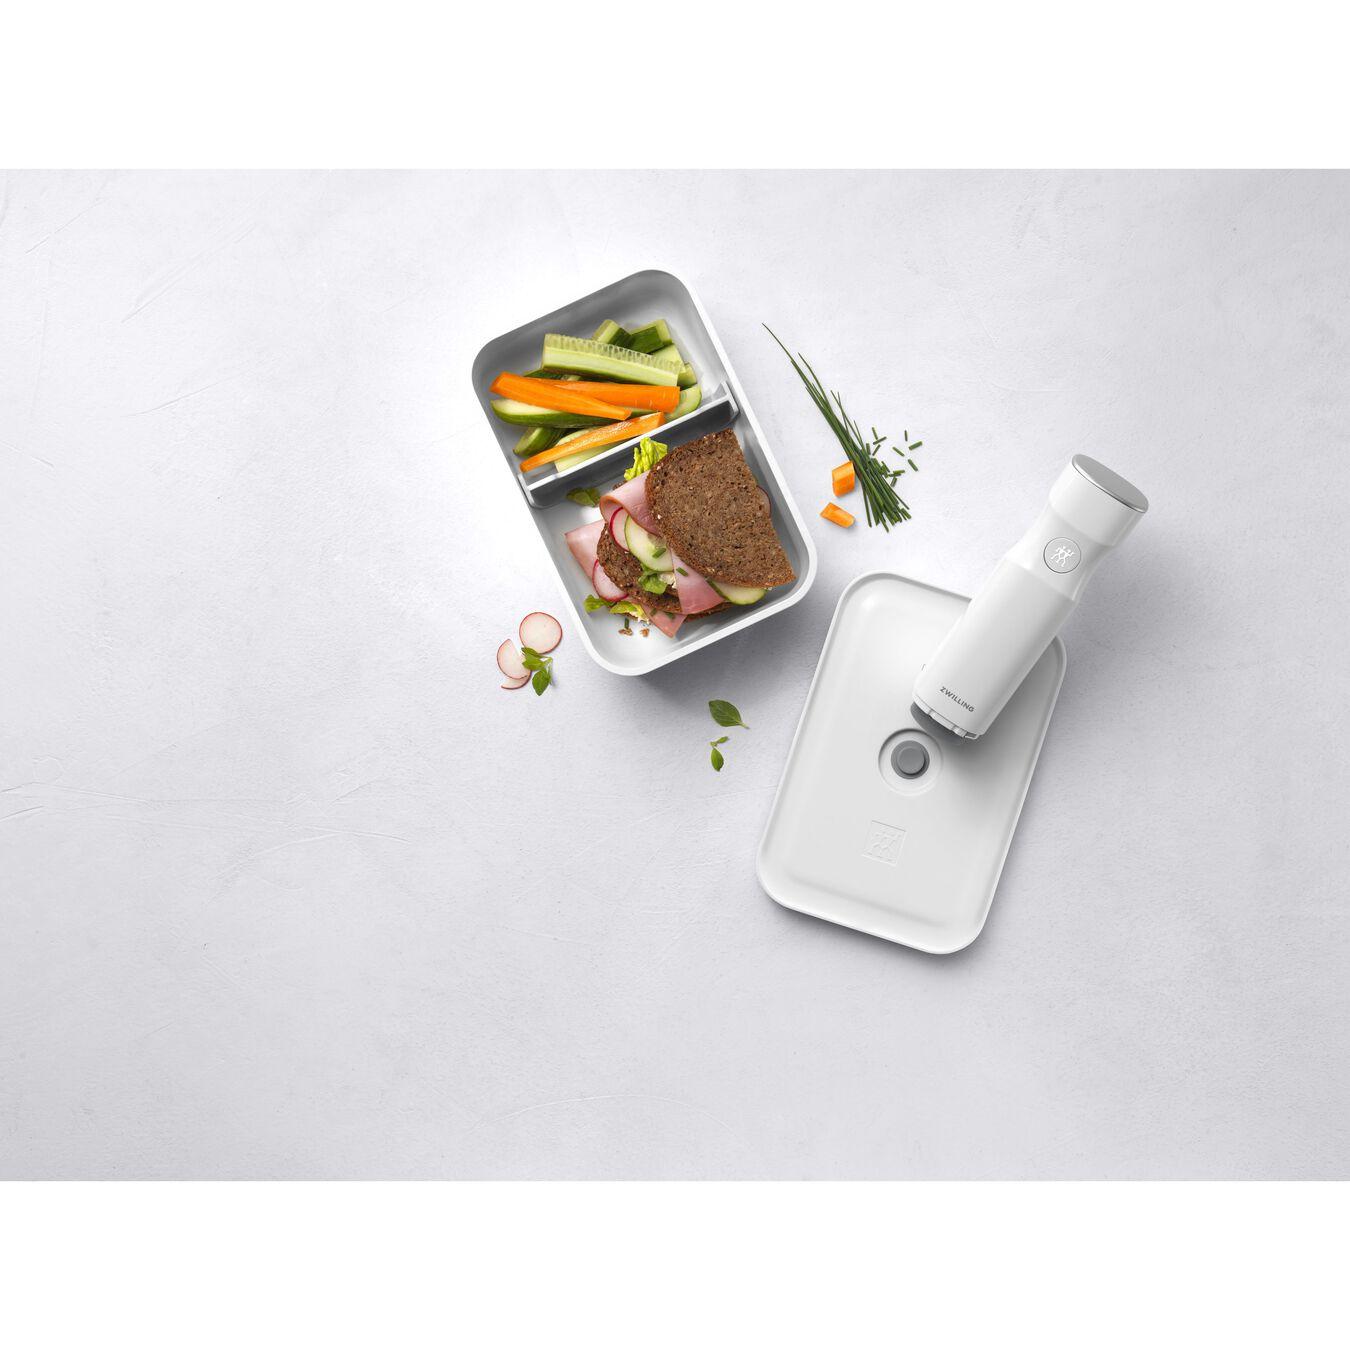 Vakuum Lunchbox, L, Kunststoff, Weiß,,large 5